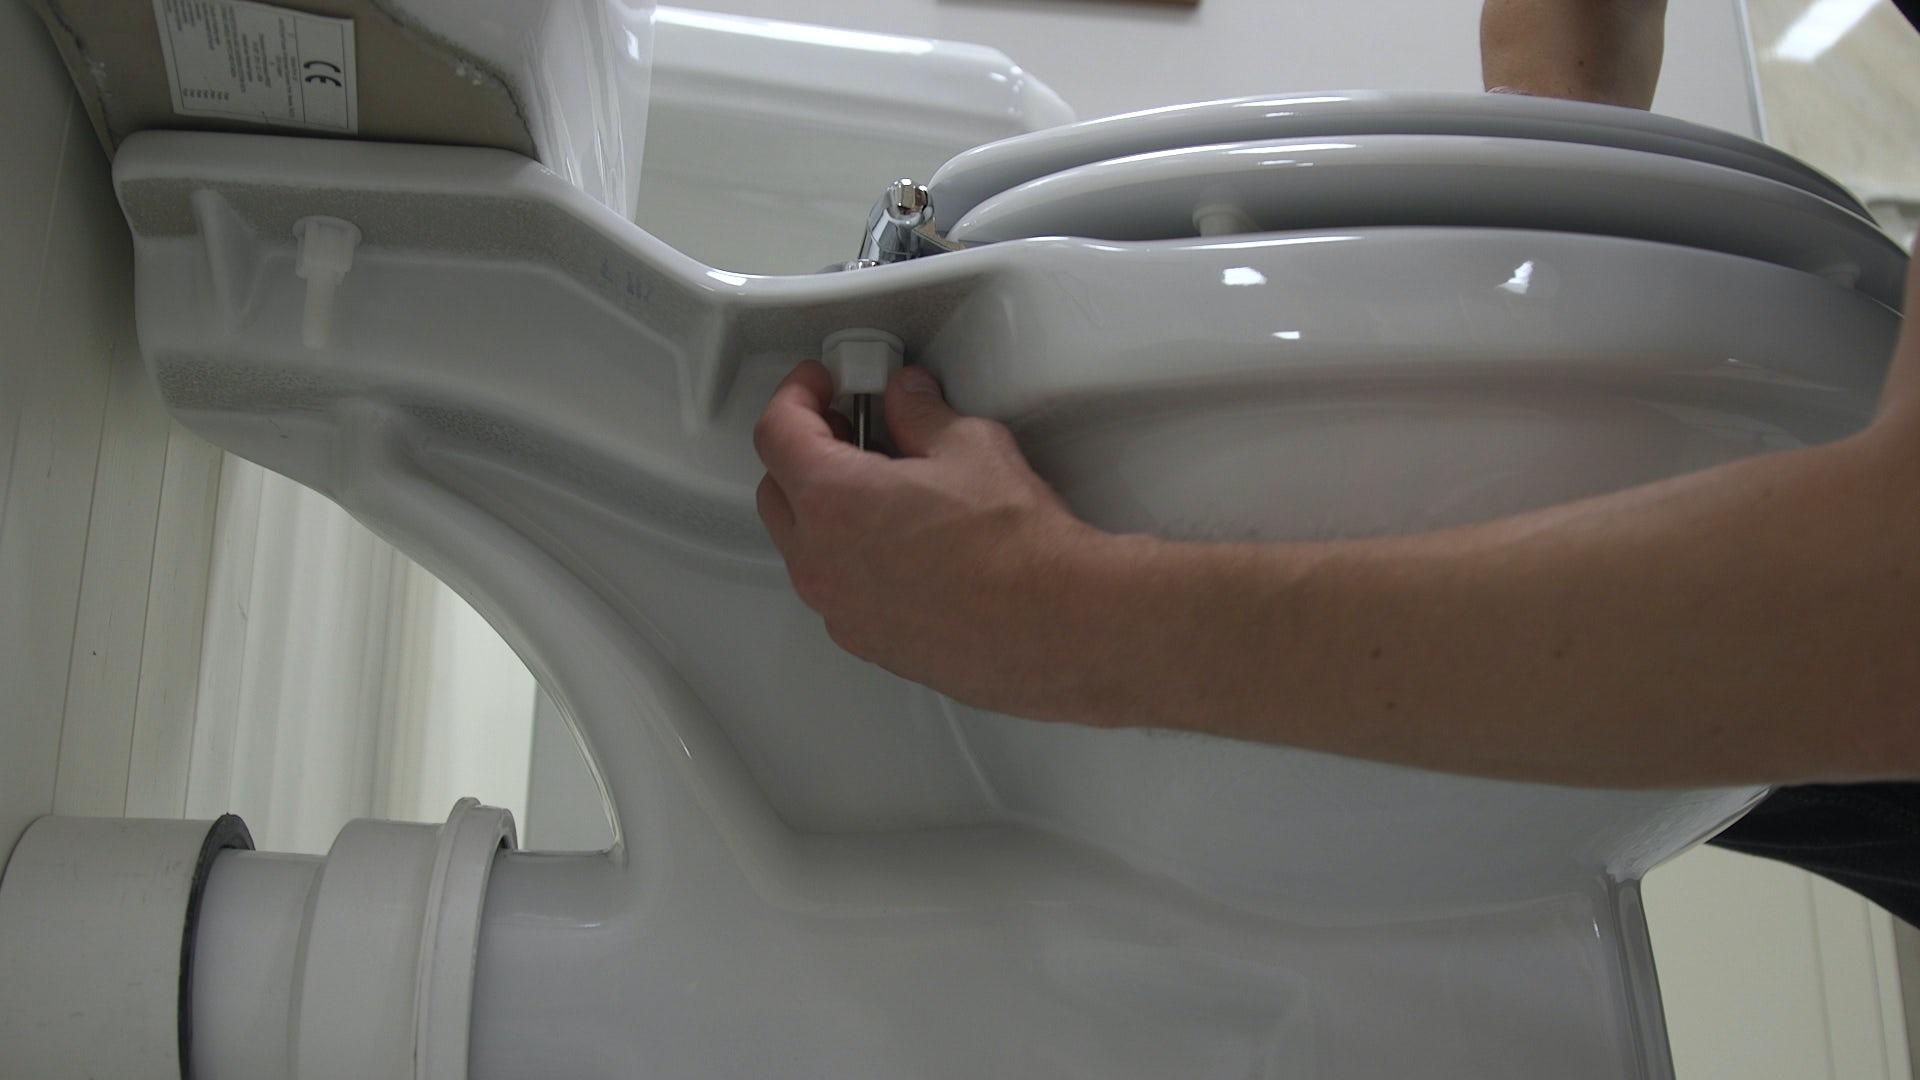 Unscrew old toilet seat